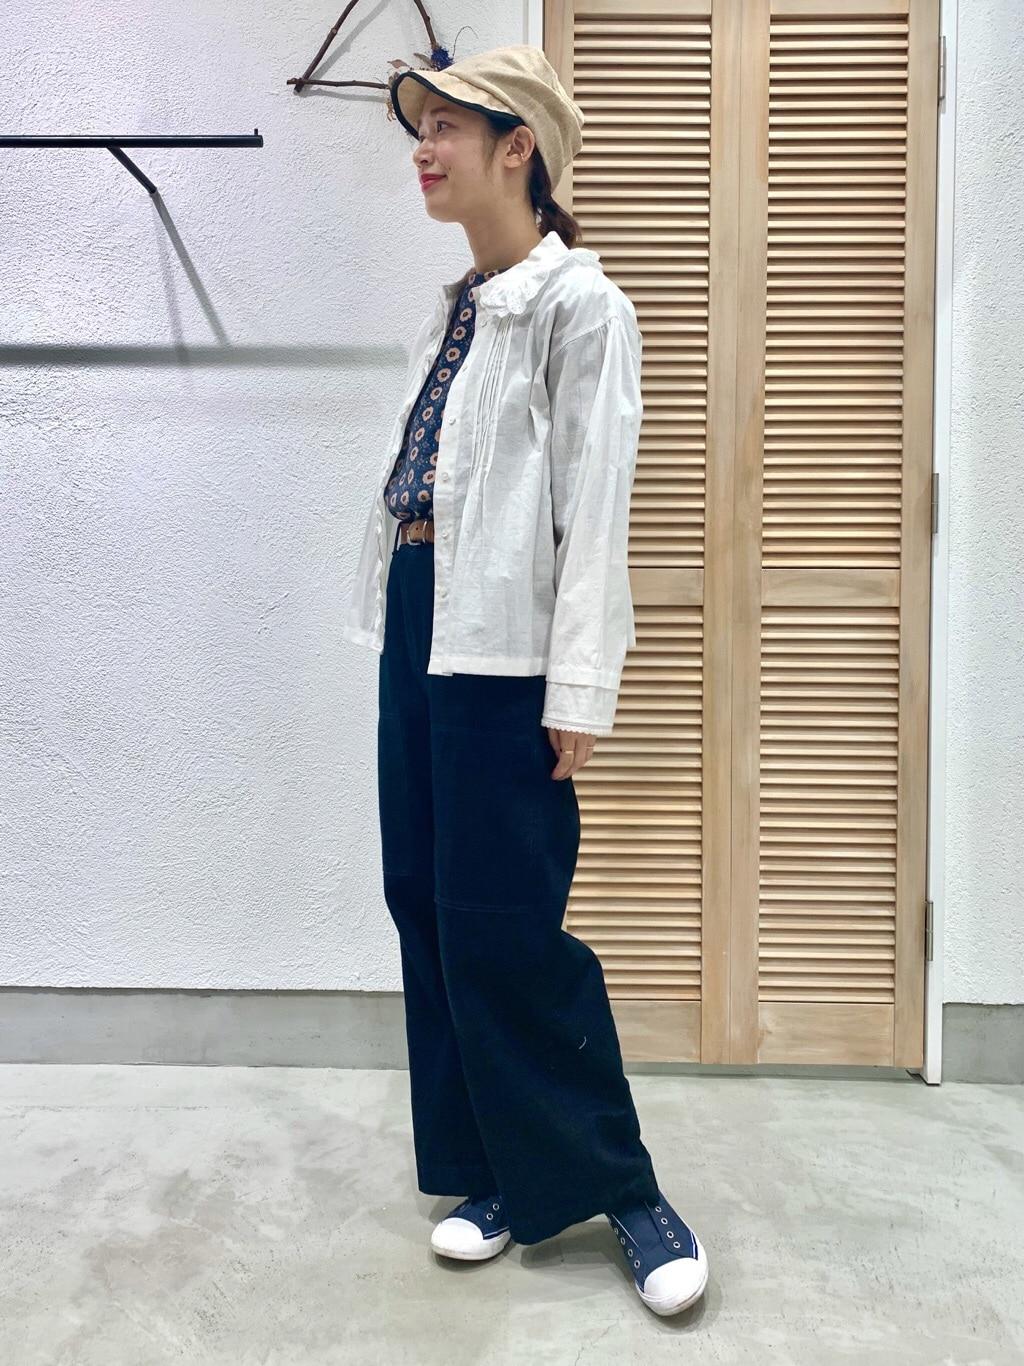 chambre de charme 横浜ジョイナス 身長:160cm 2021.02.25